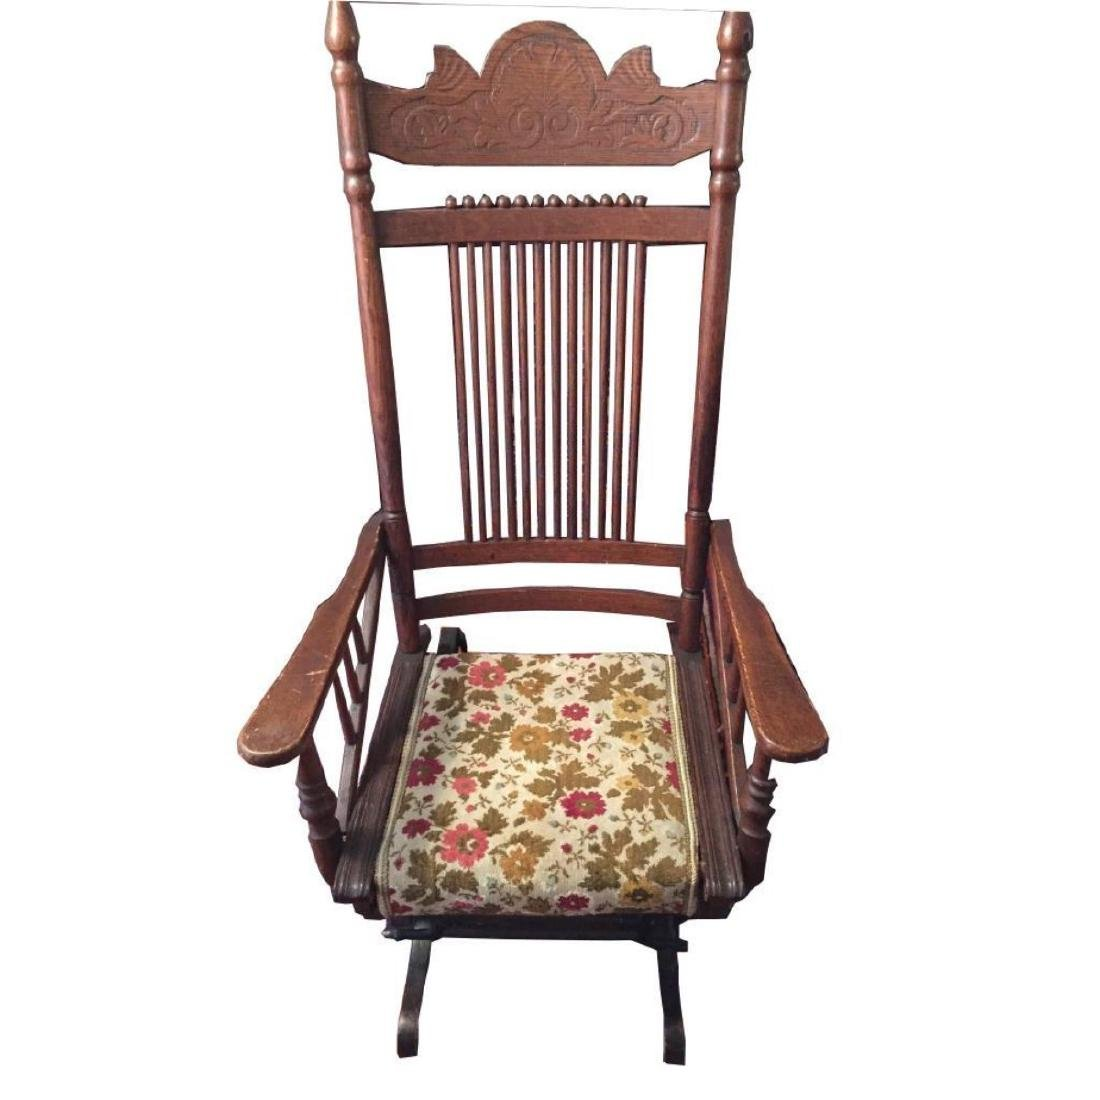 Late 19thc Victorian Oak Glyder Rocking Chair - 2